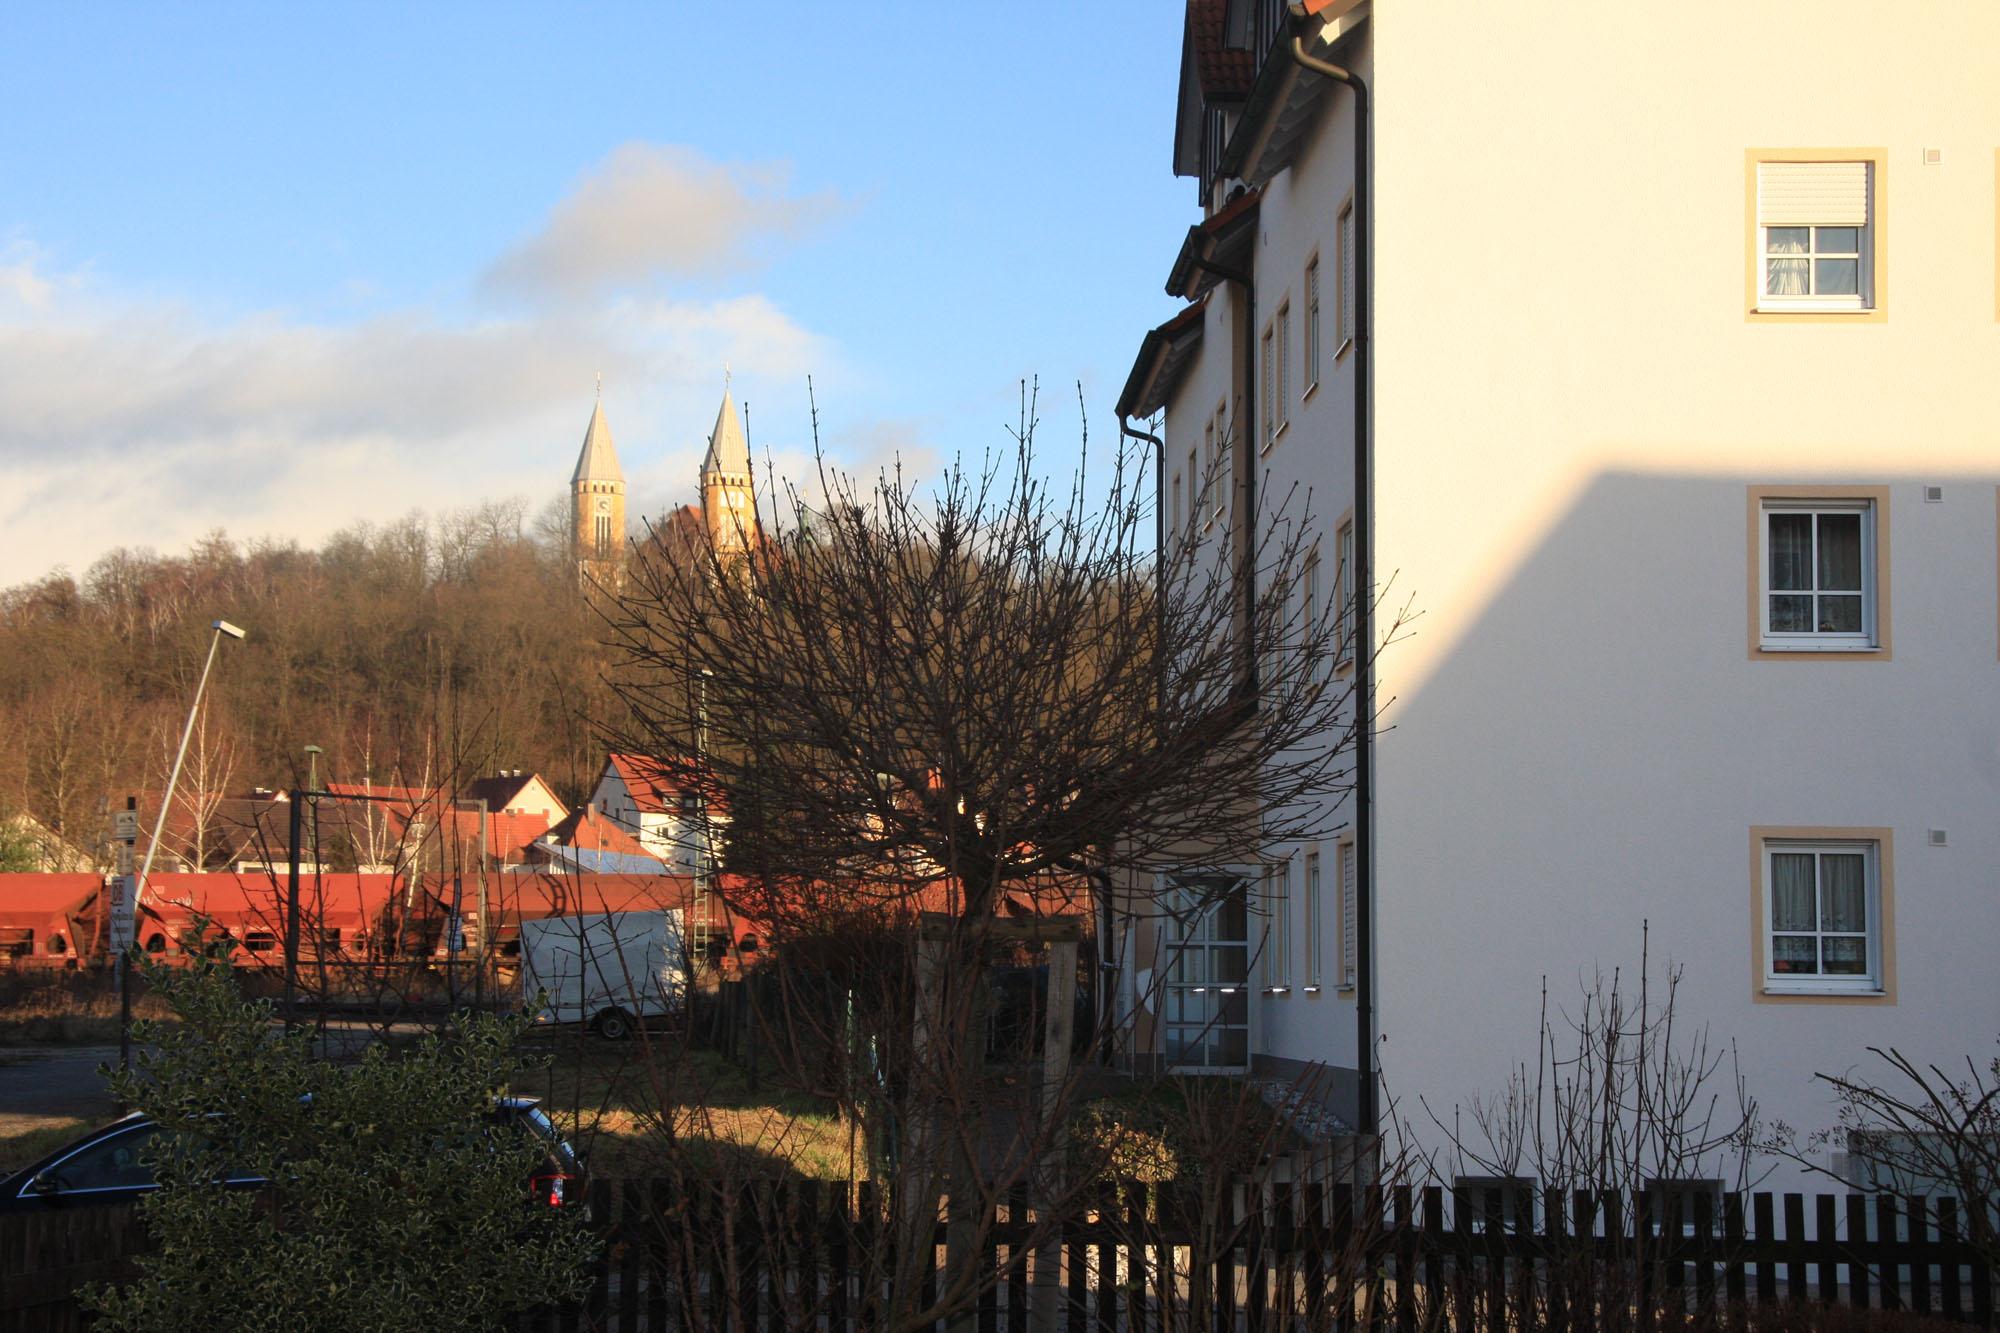 bachstrasse_allg_7